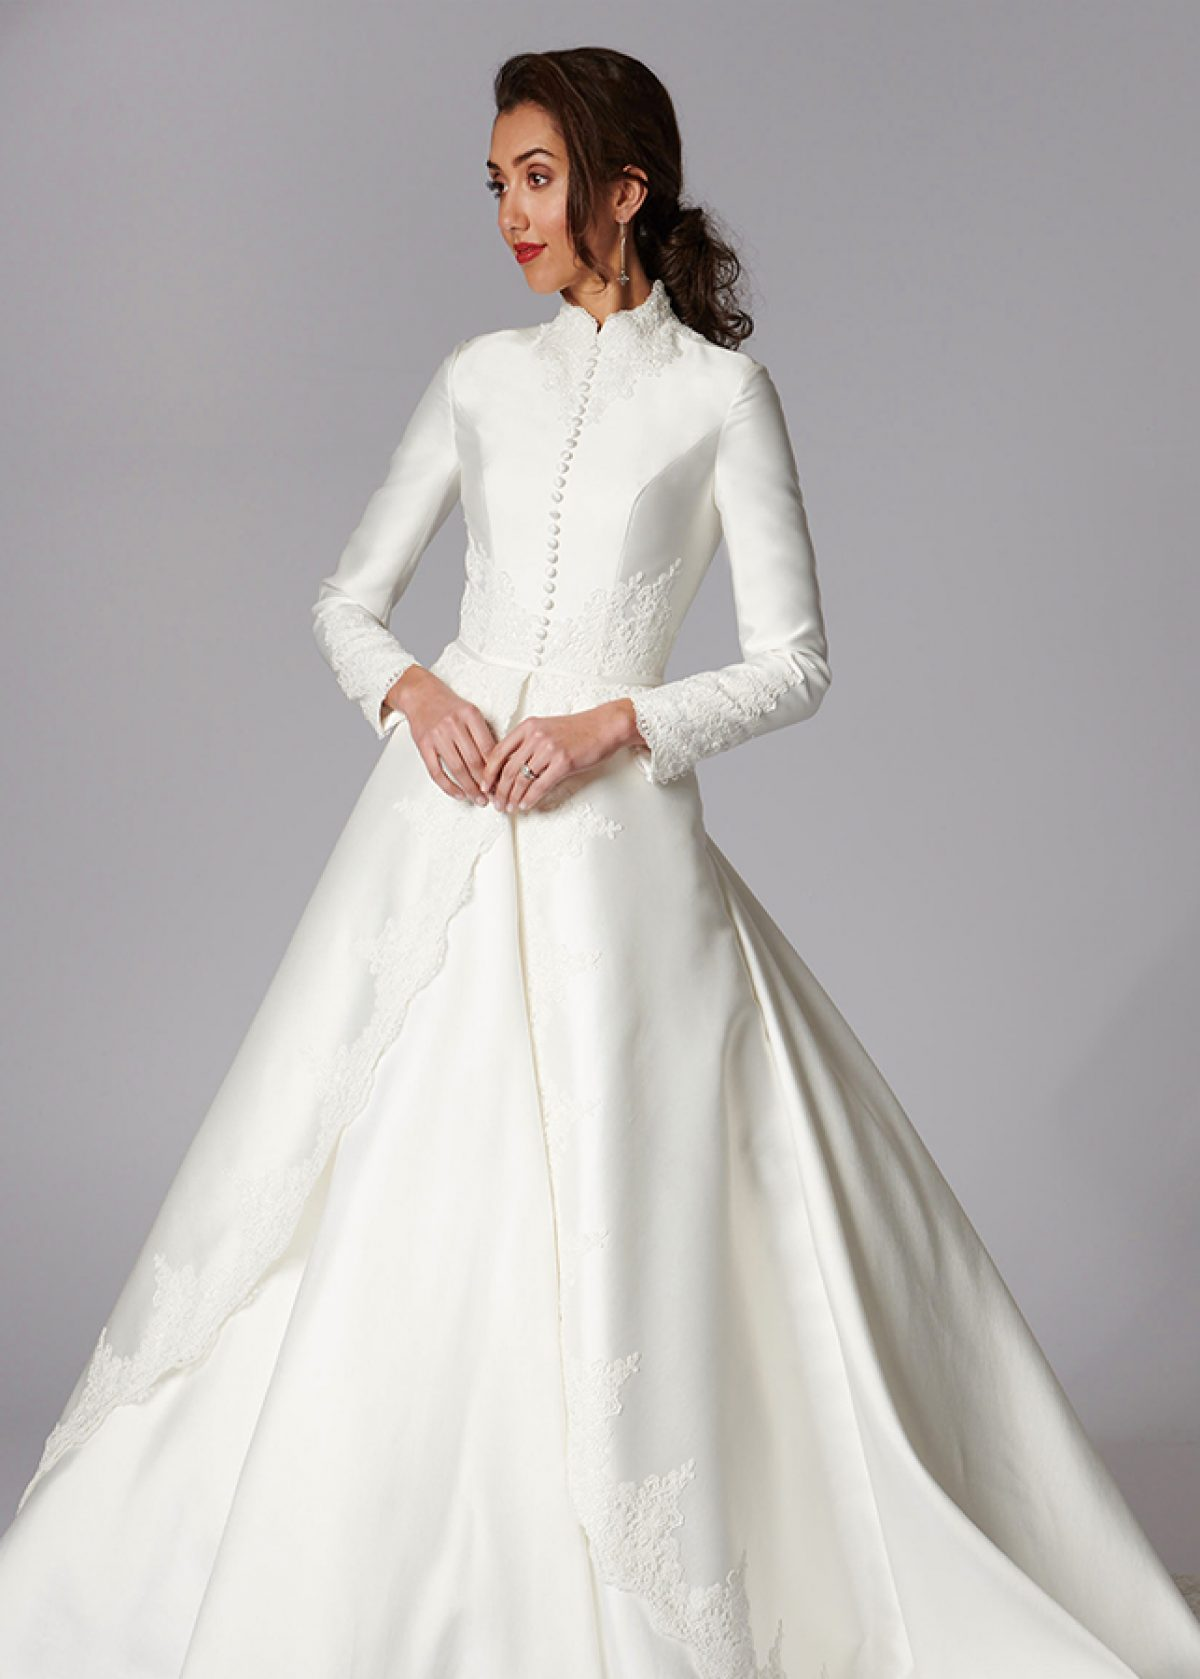 Modest Wedding Dresses Conservative Dresses For Weddings